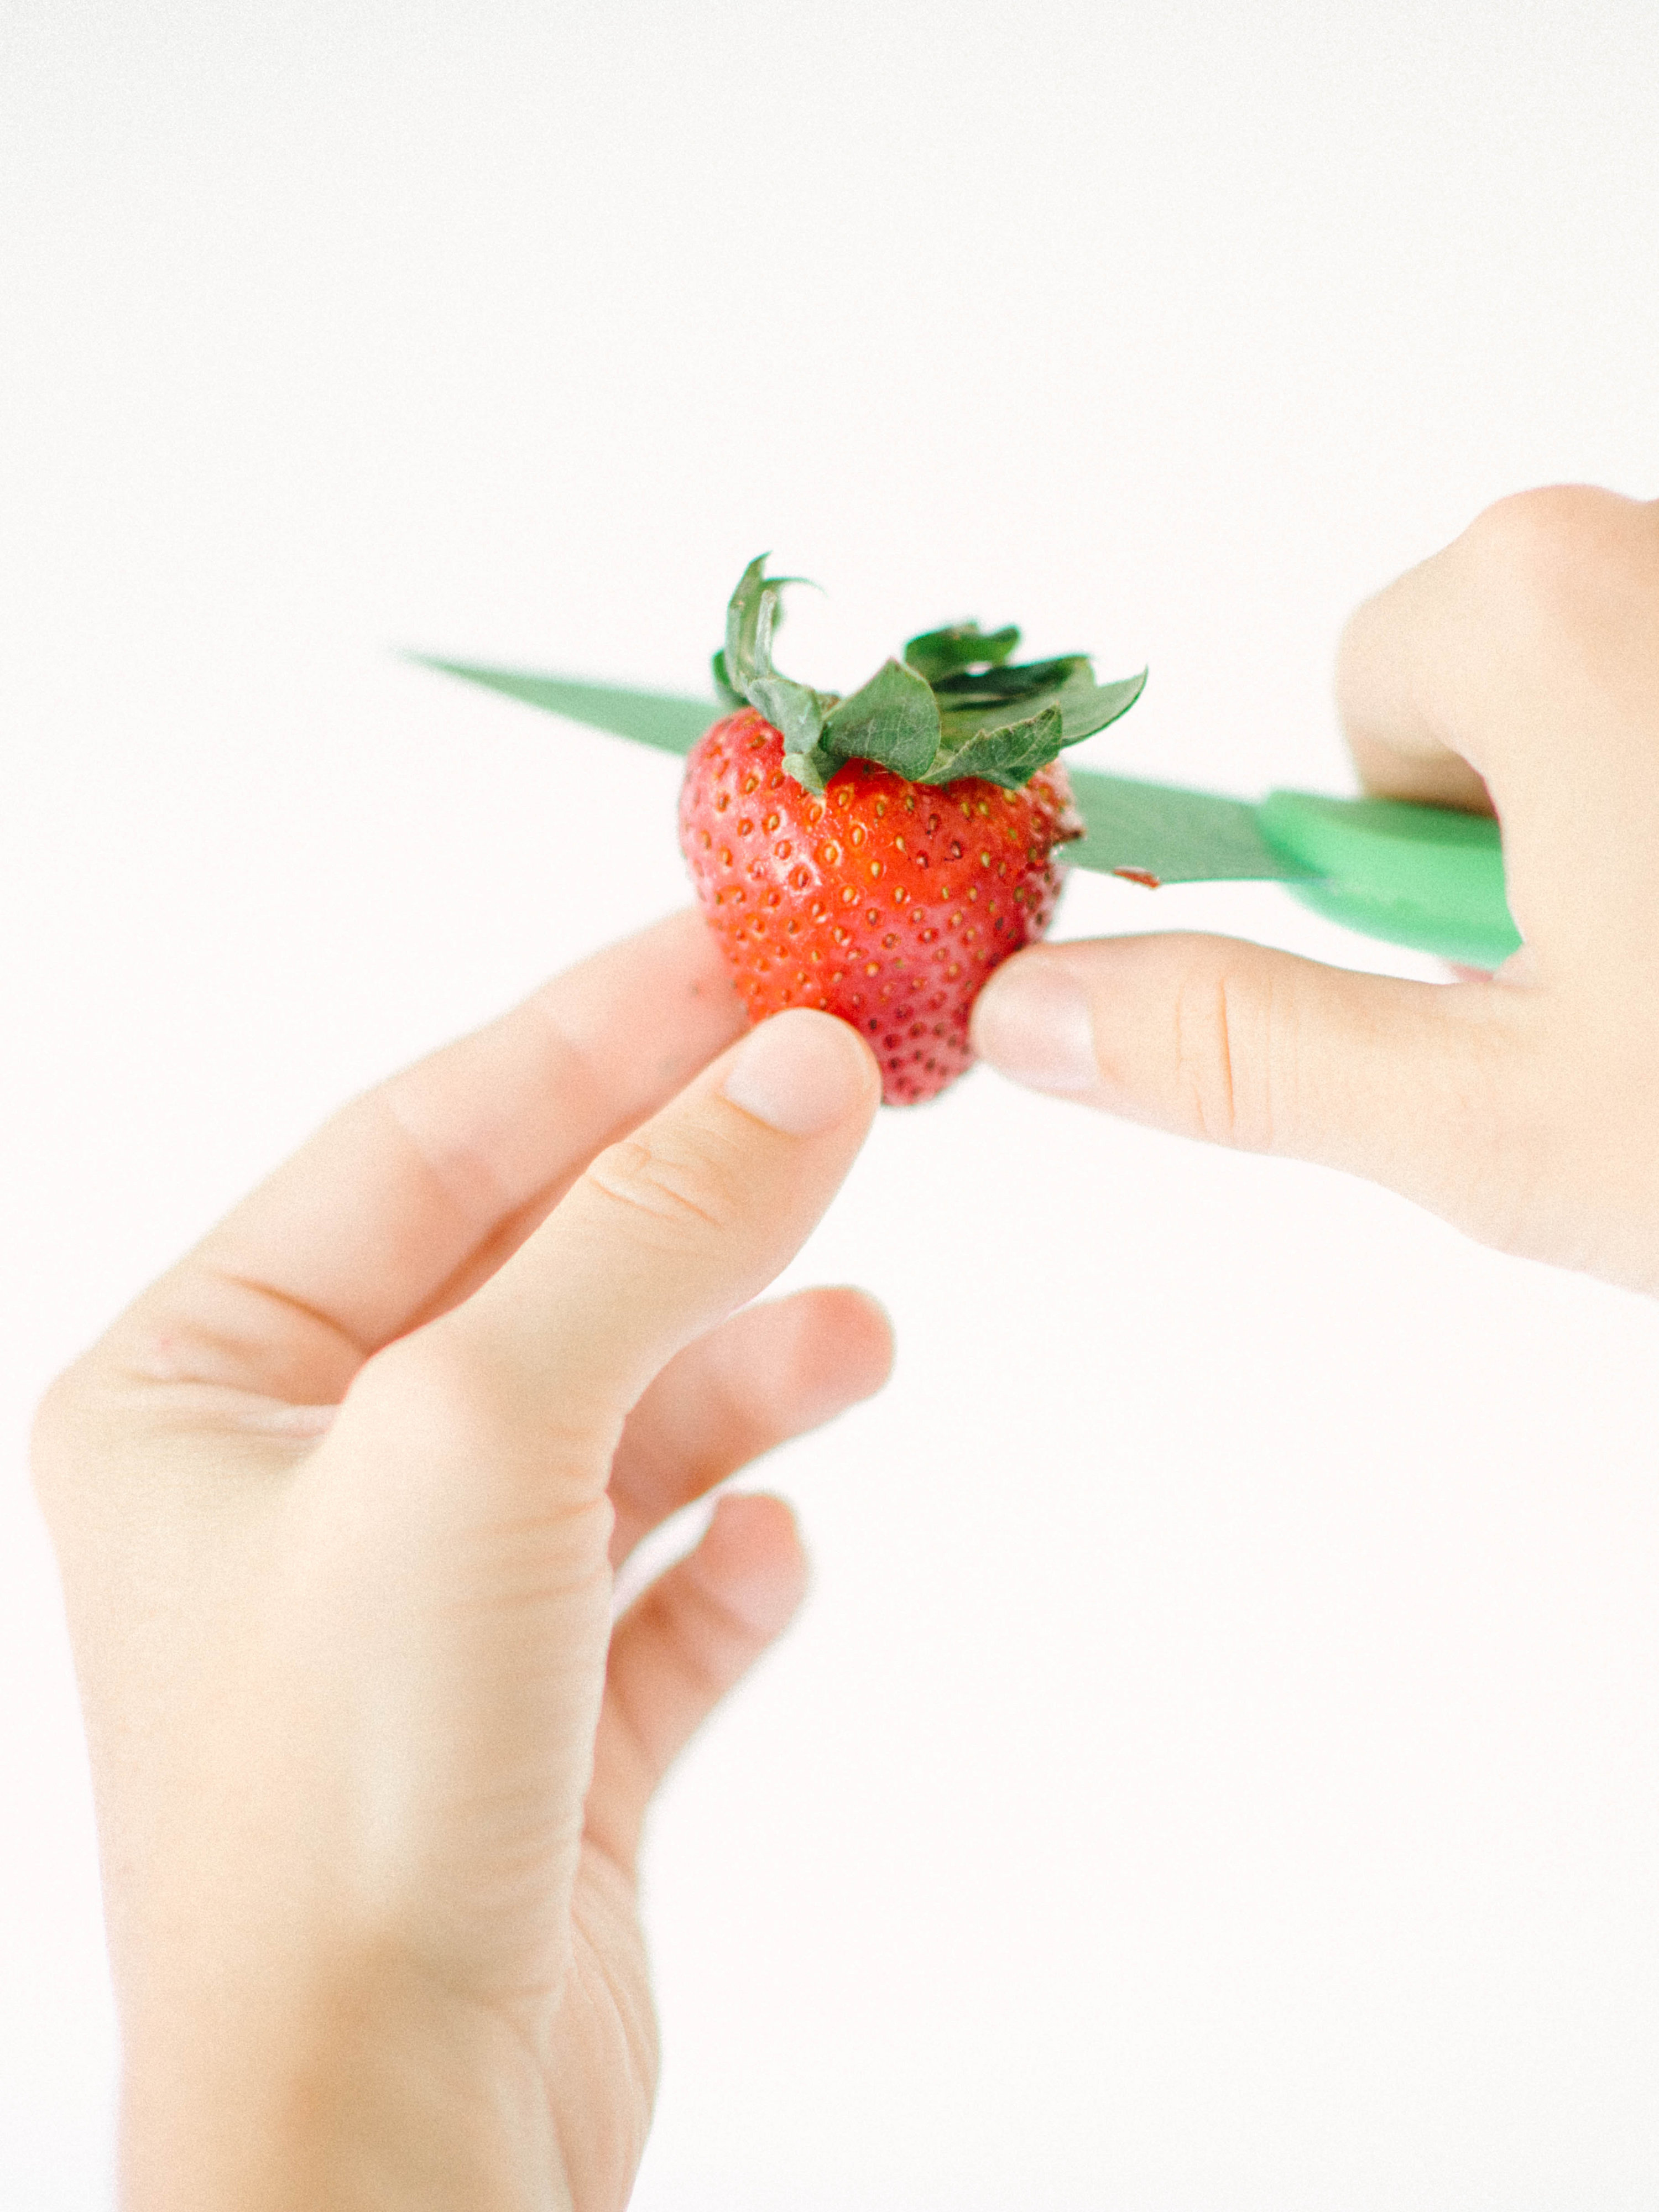 Dairy Free Cheesecake Stuffed Strawberries - Communikait by Kait Hanson #dairyfree #dessert #dairyfreecheesecake #summer #strawberryrecipe